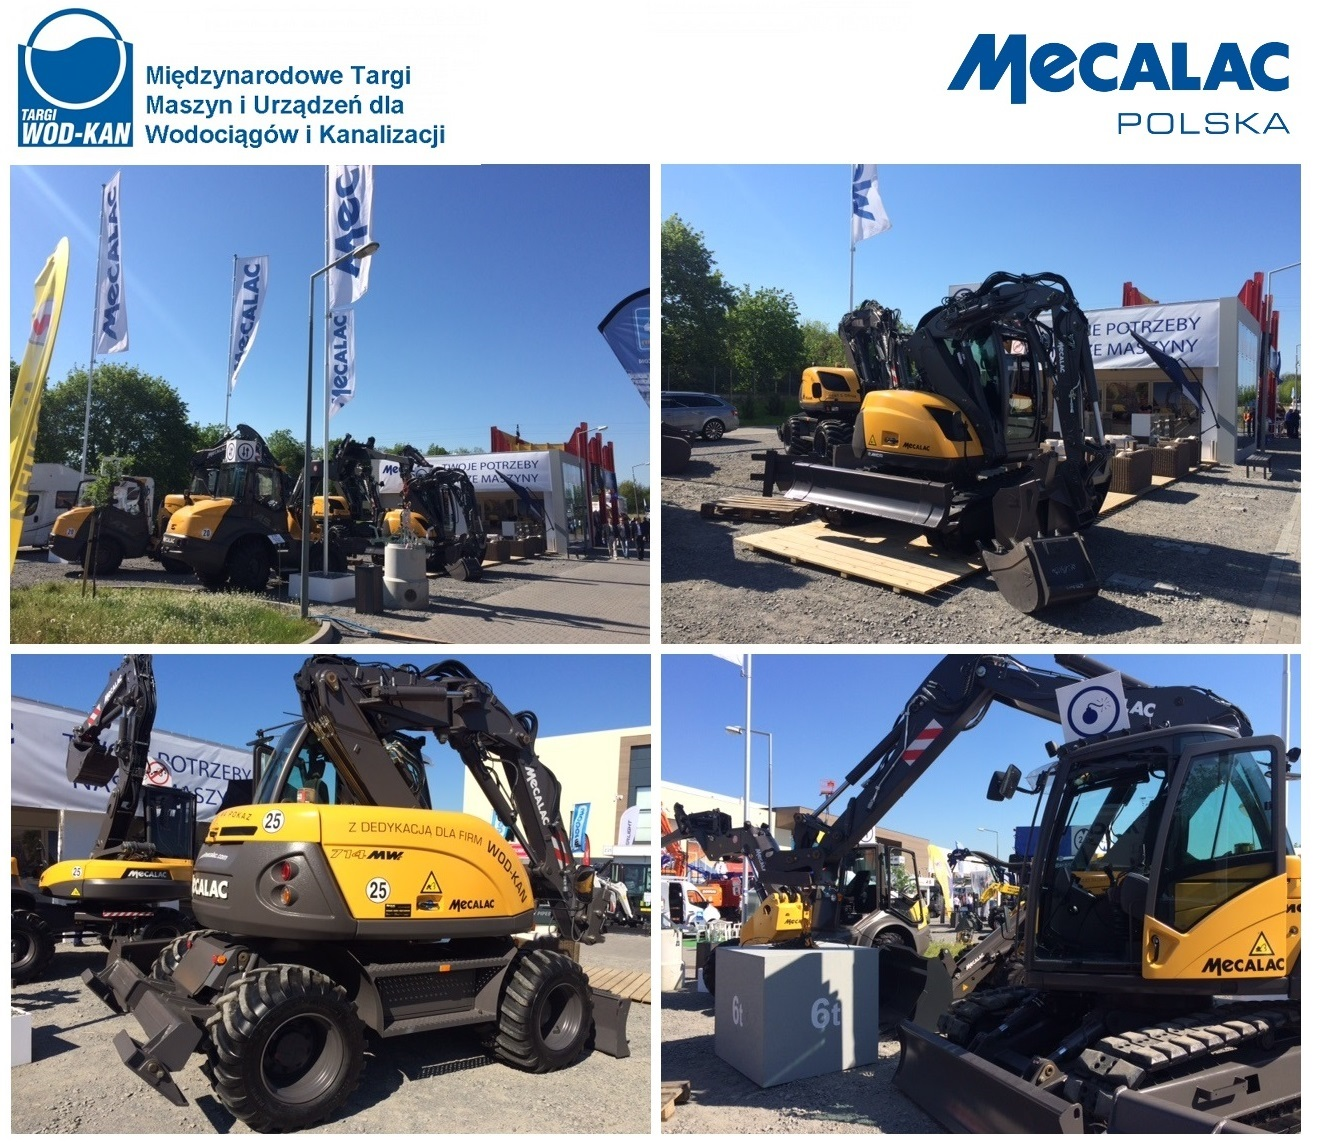 Mecalac Polska at WOD-KAN International Fair